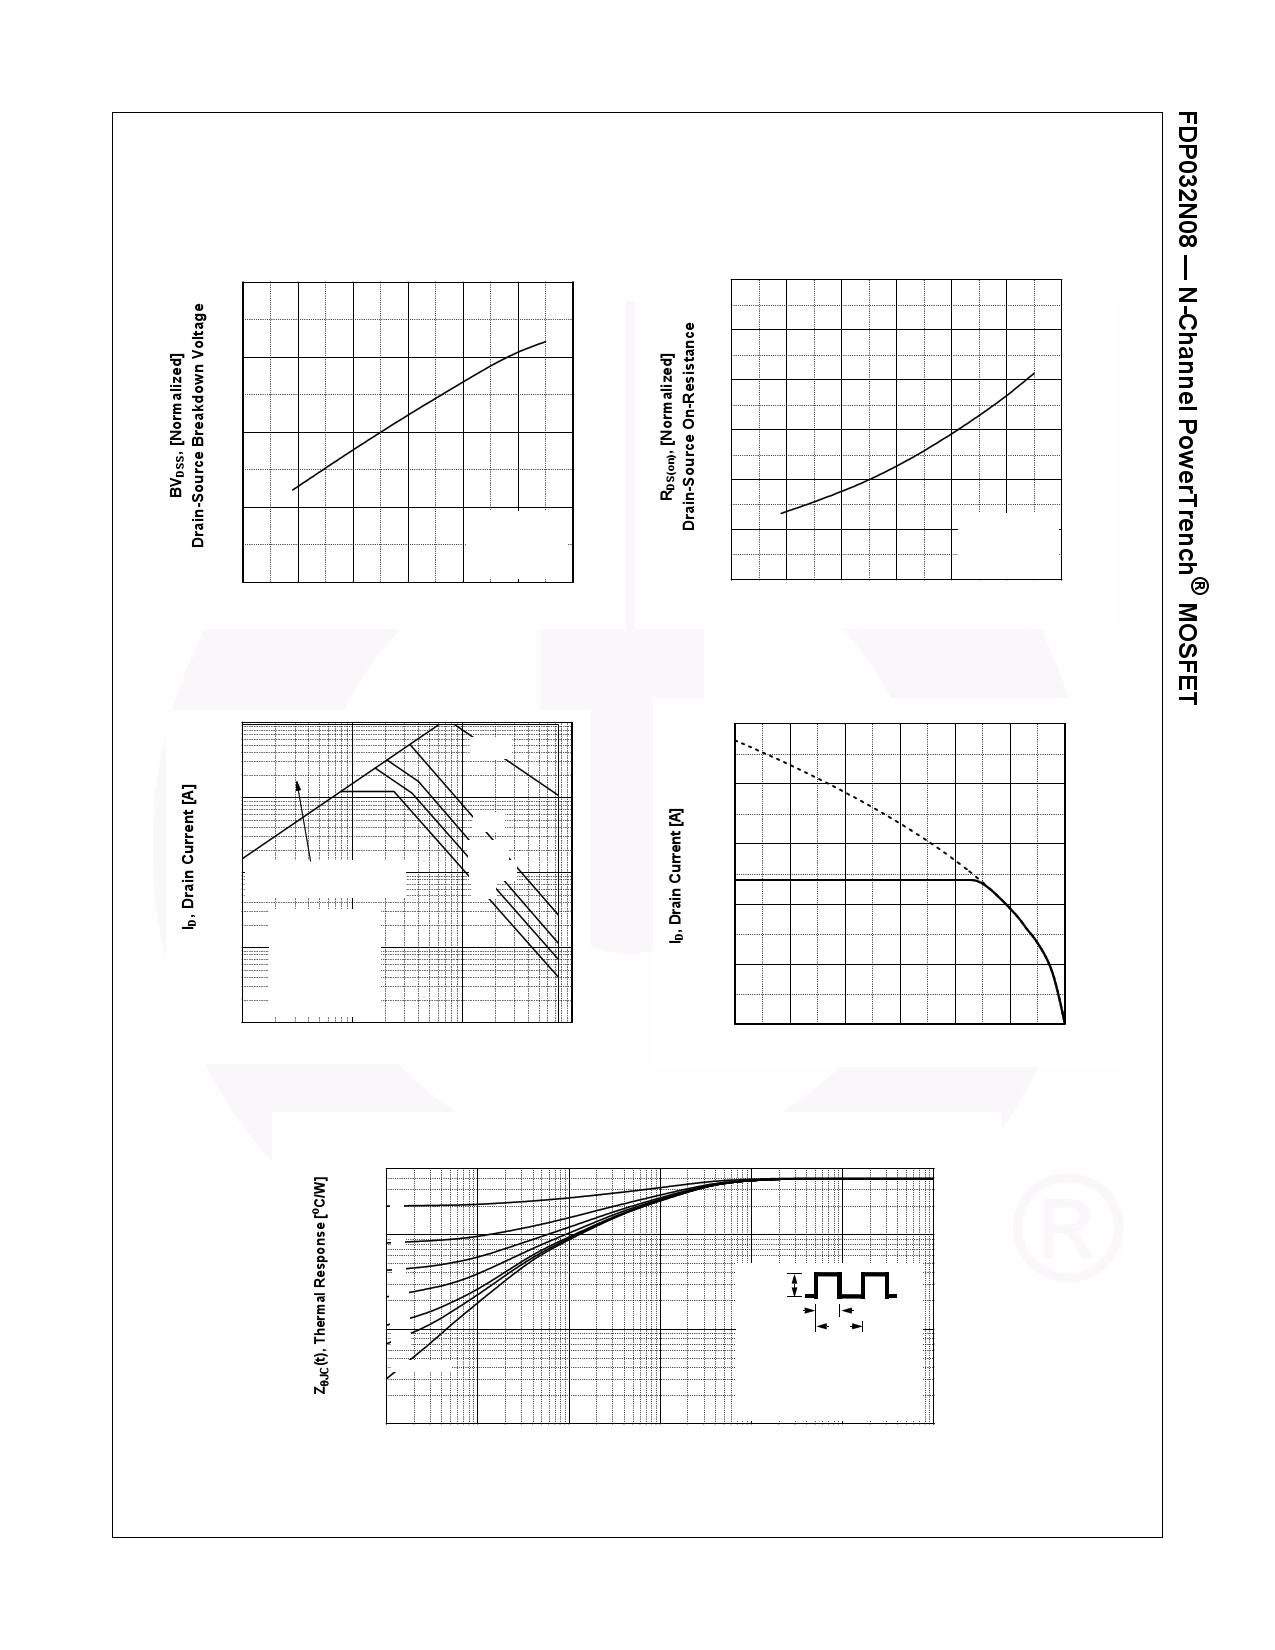 FDP032N08 pdf, 반도체, 판매, 대치품